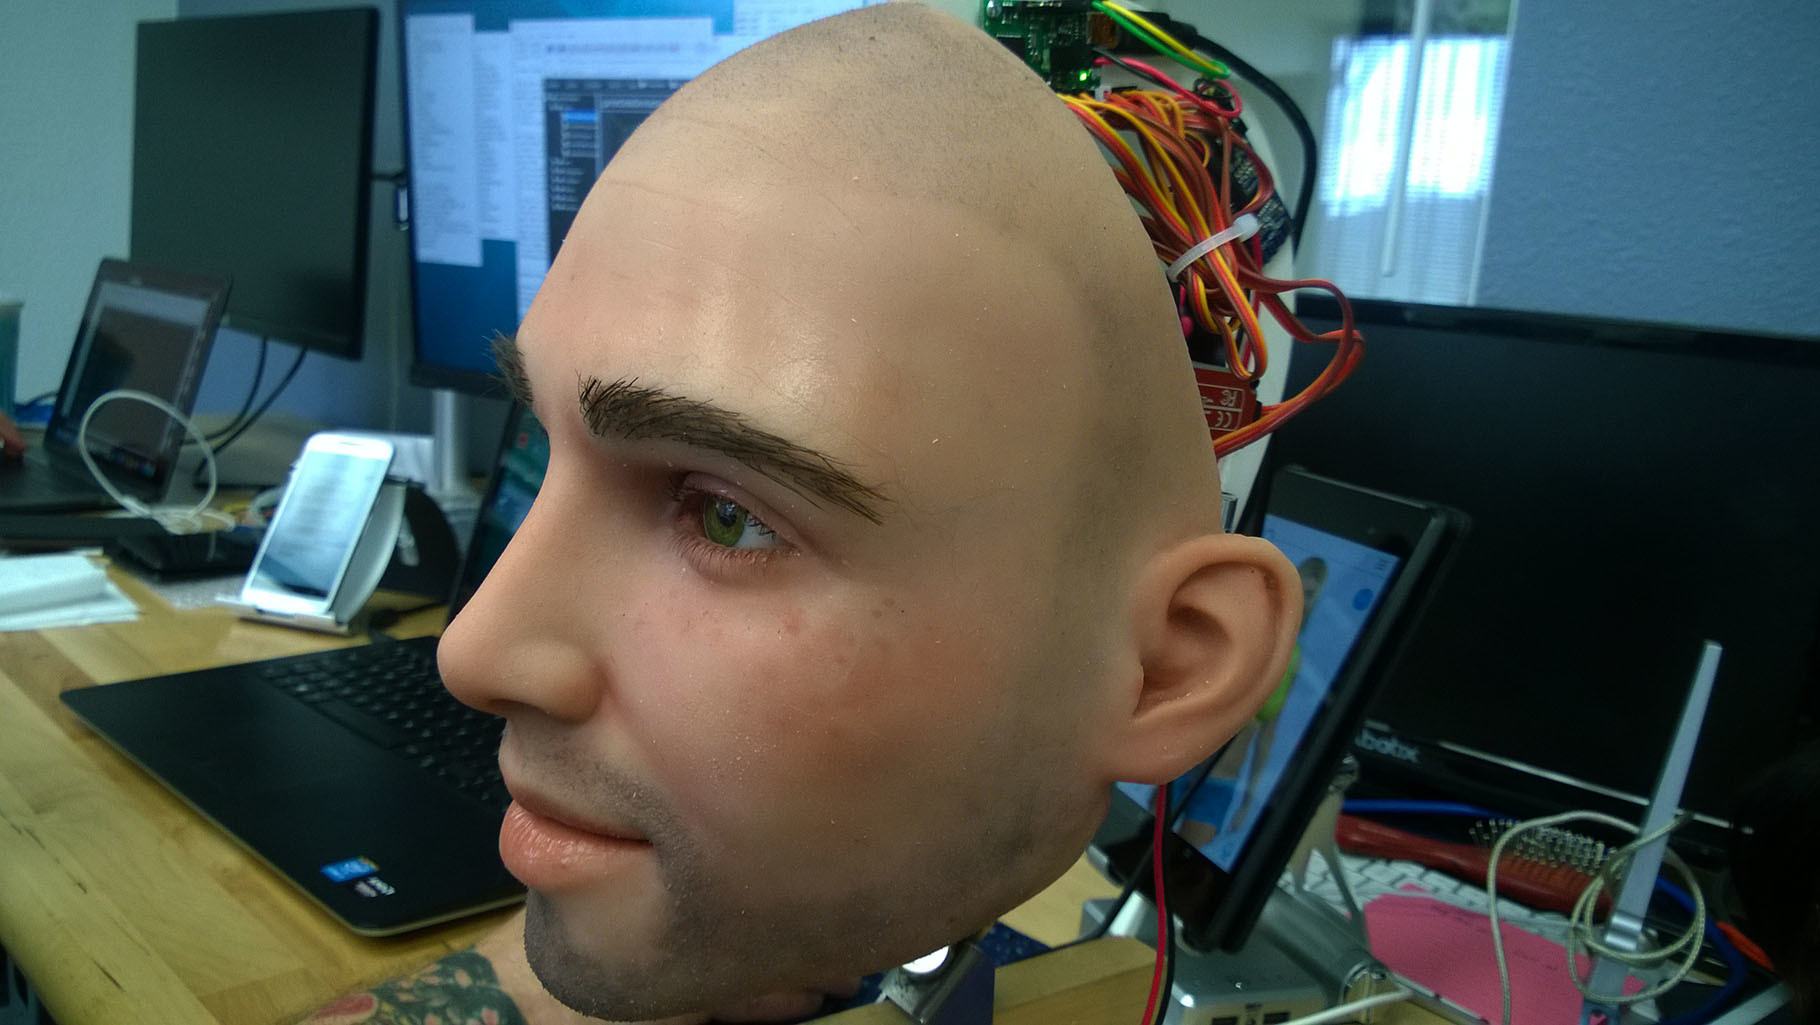 tecnologia-inteligencia-artificial-realbotix